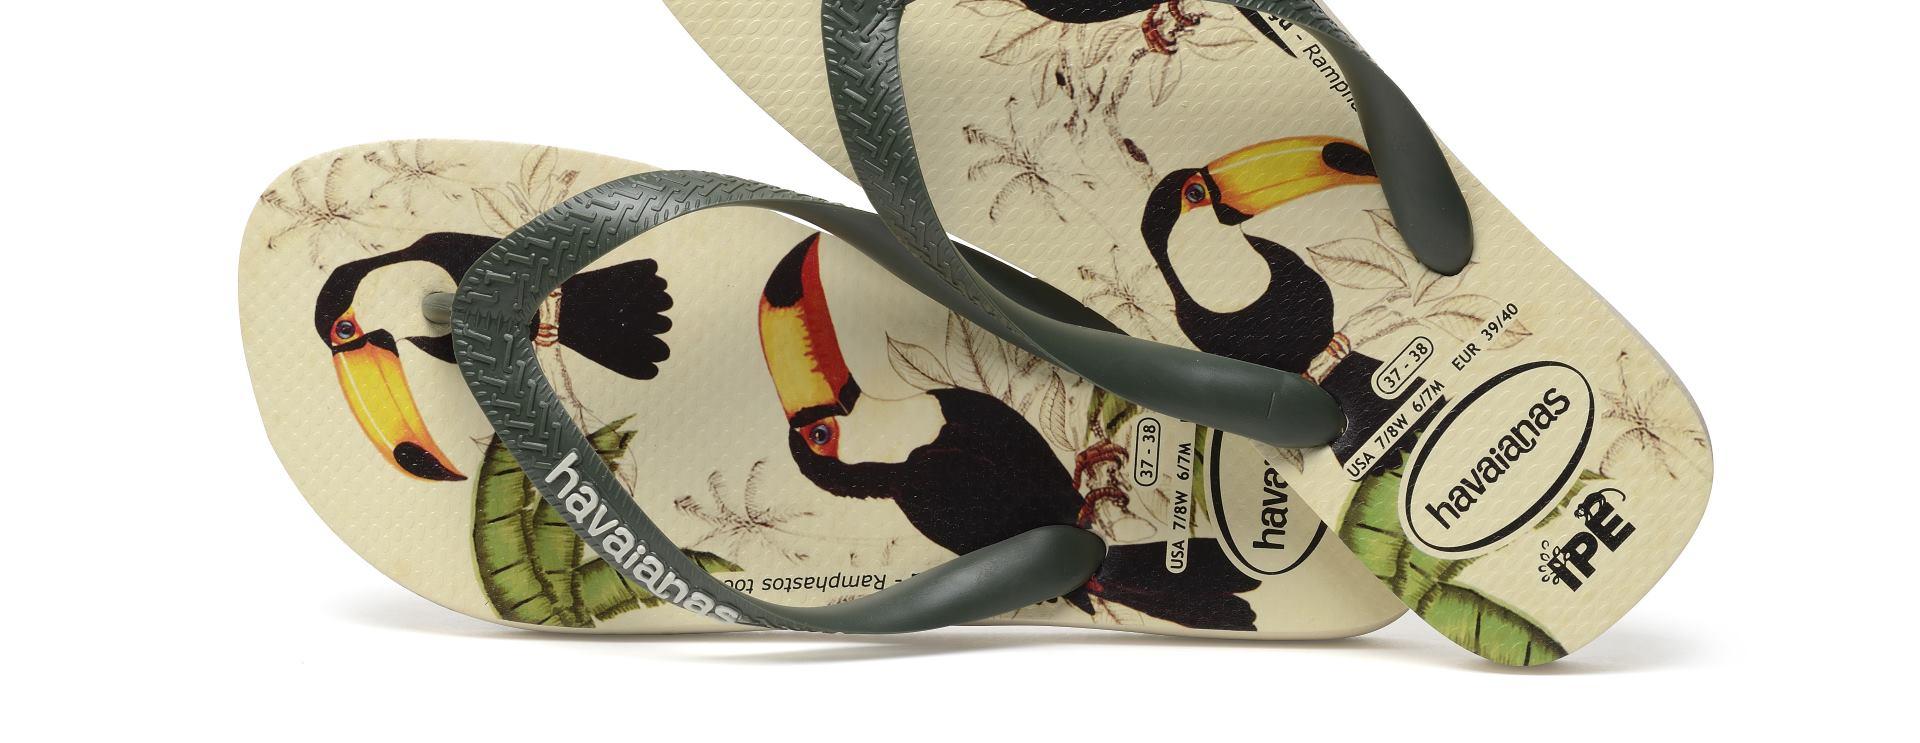 Havaianas IPE kolekcija – japanke s printevima divljih vrsta u misiji očuvanja biološke raznolikosti Brazila